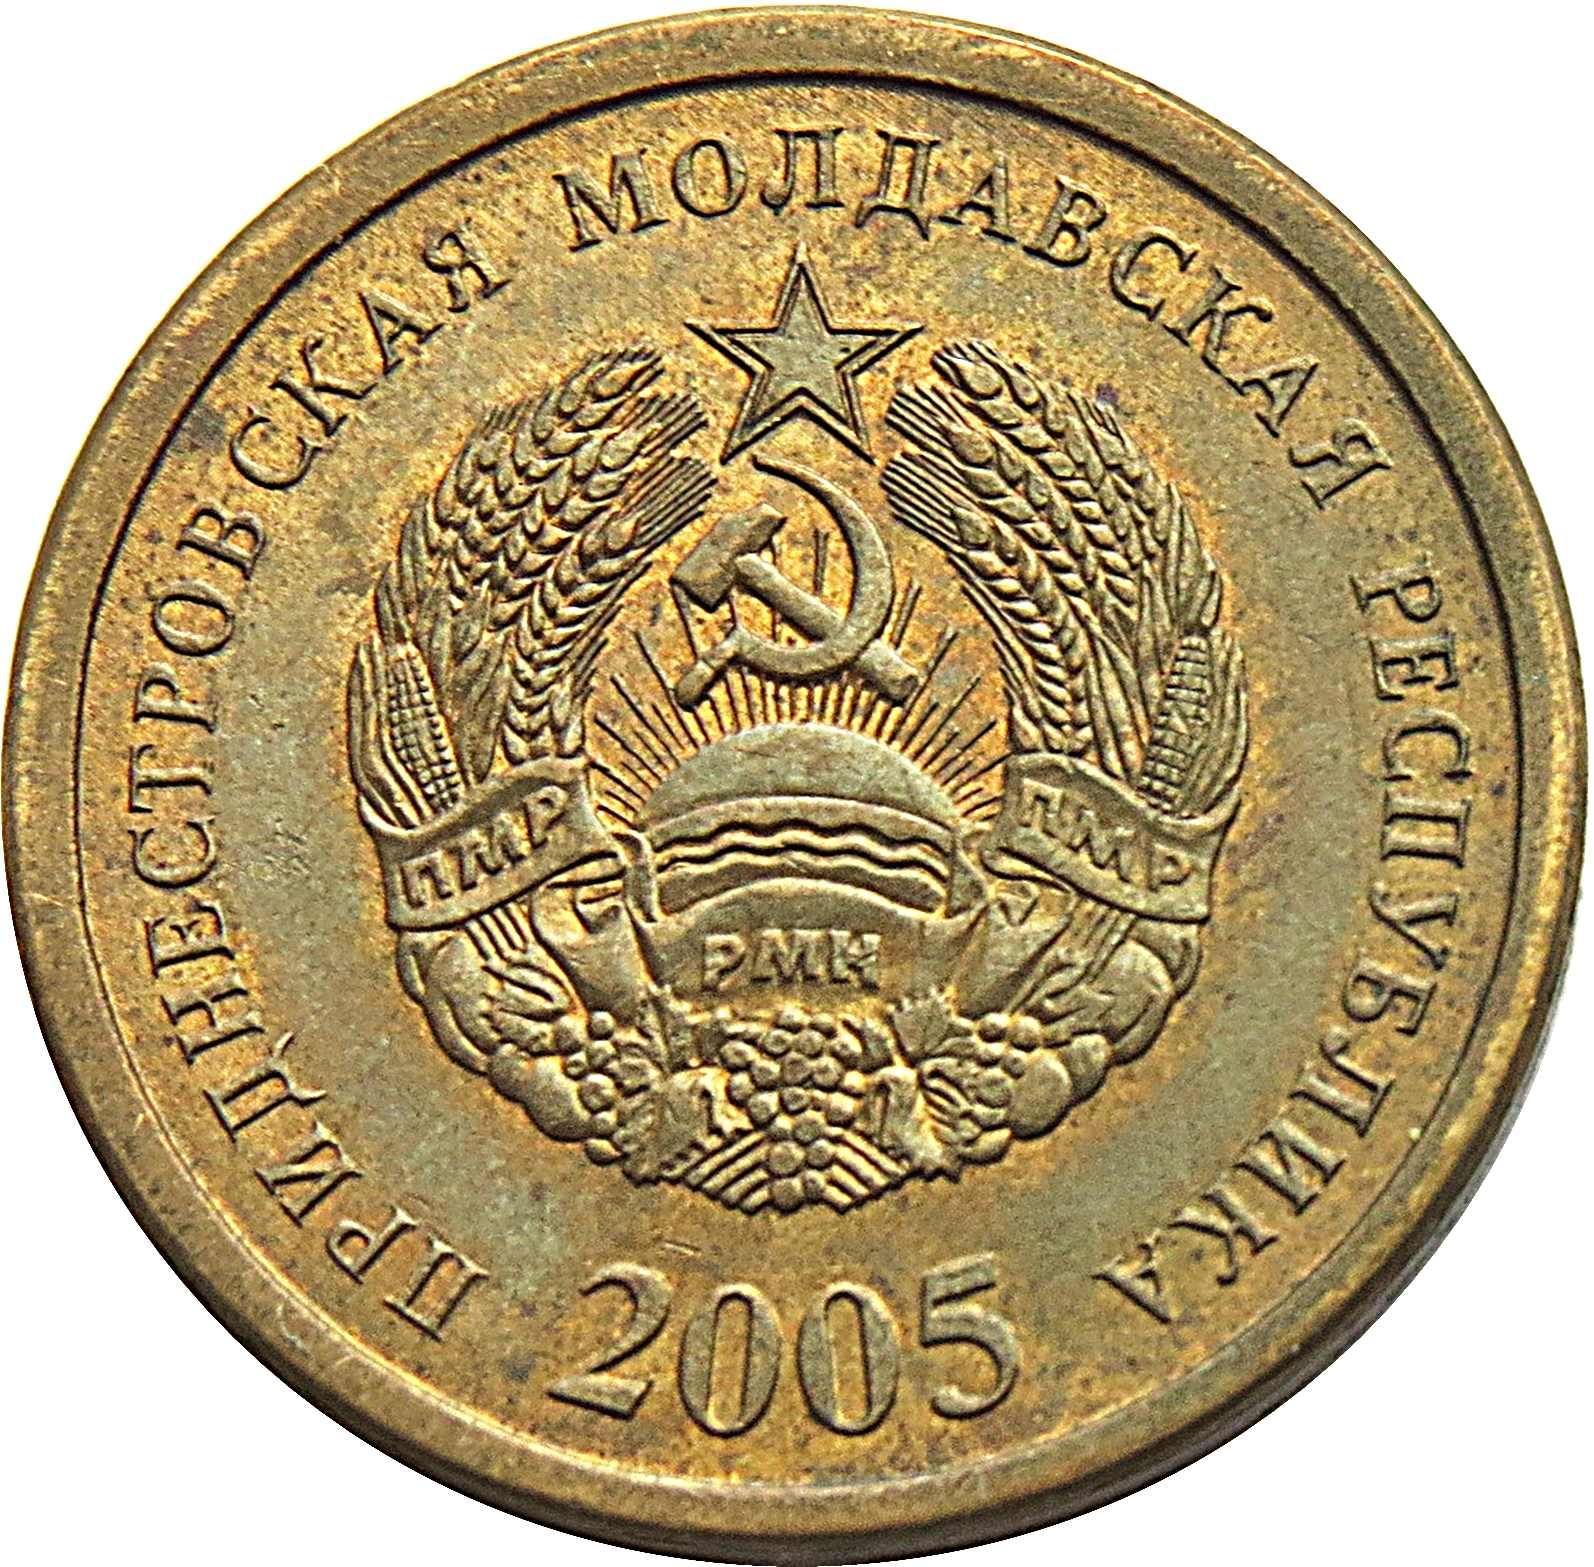 2000-2005 25 50 Kopeek 1 5 10 UNC Transnistria Set 5 Coins